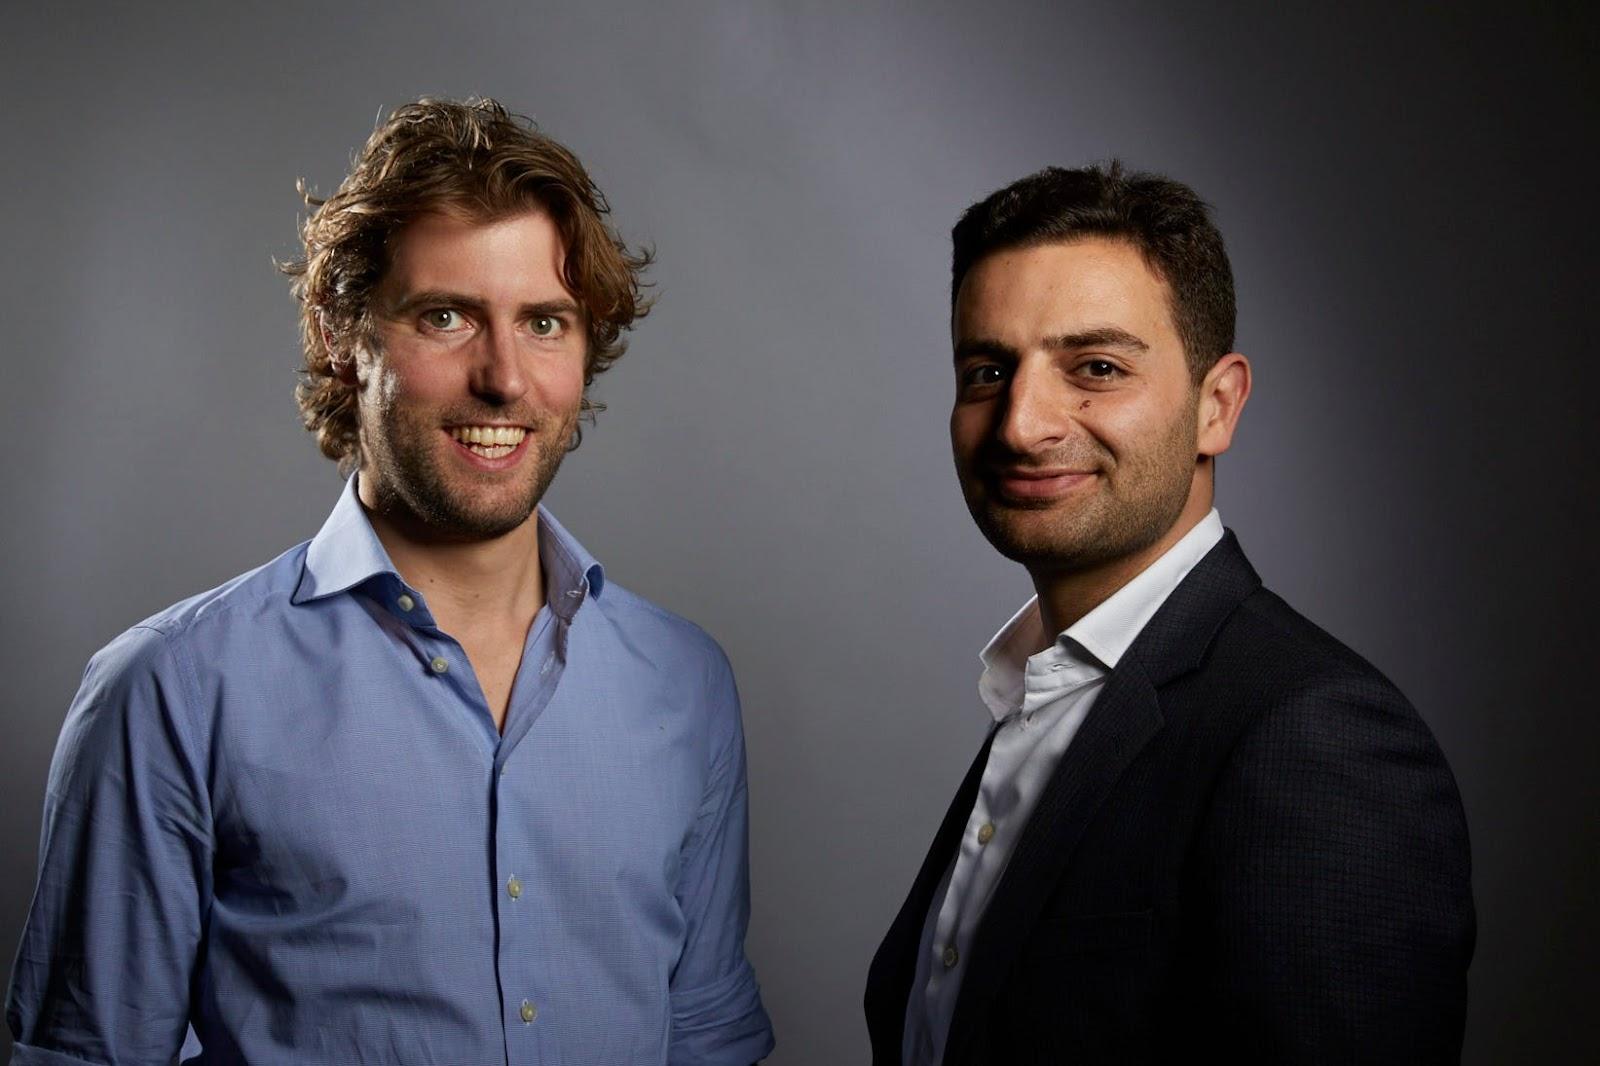 Studytube-oprichters-Gerhard-Riphagen-en-Homam-Karimi